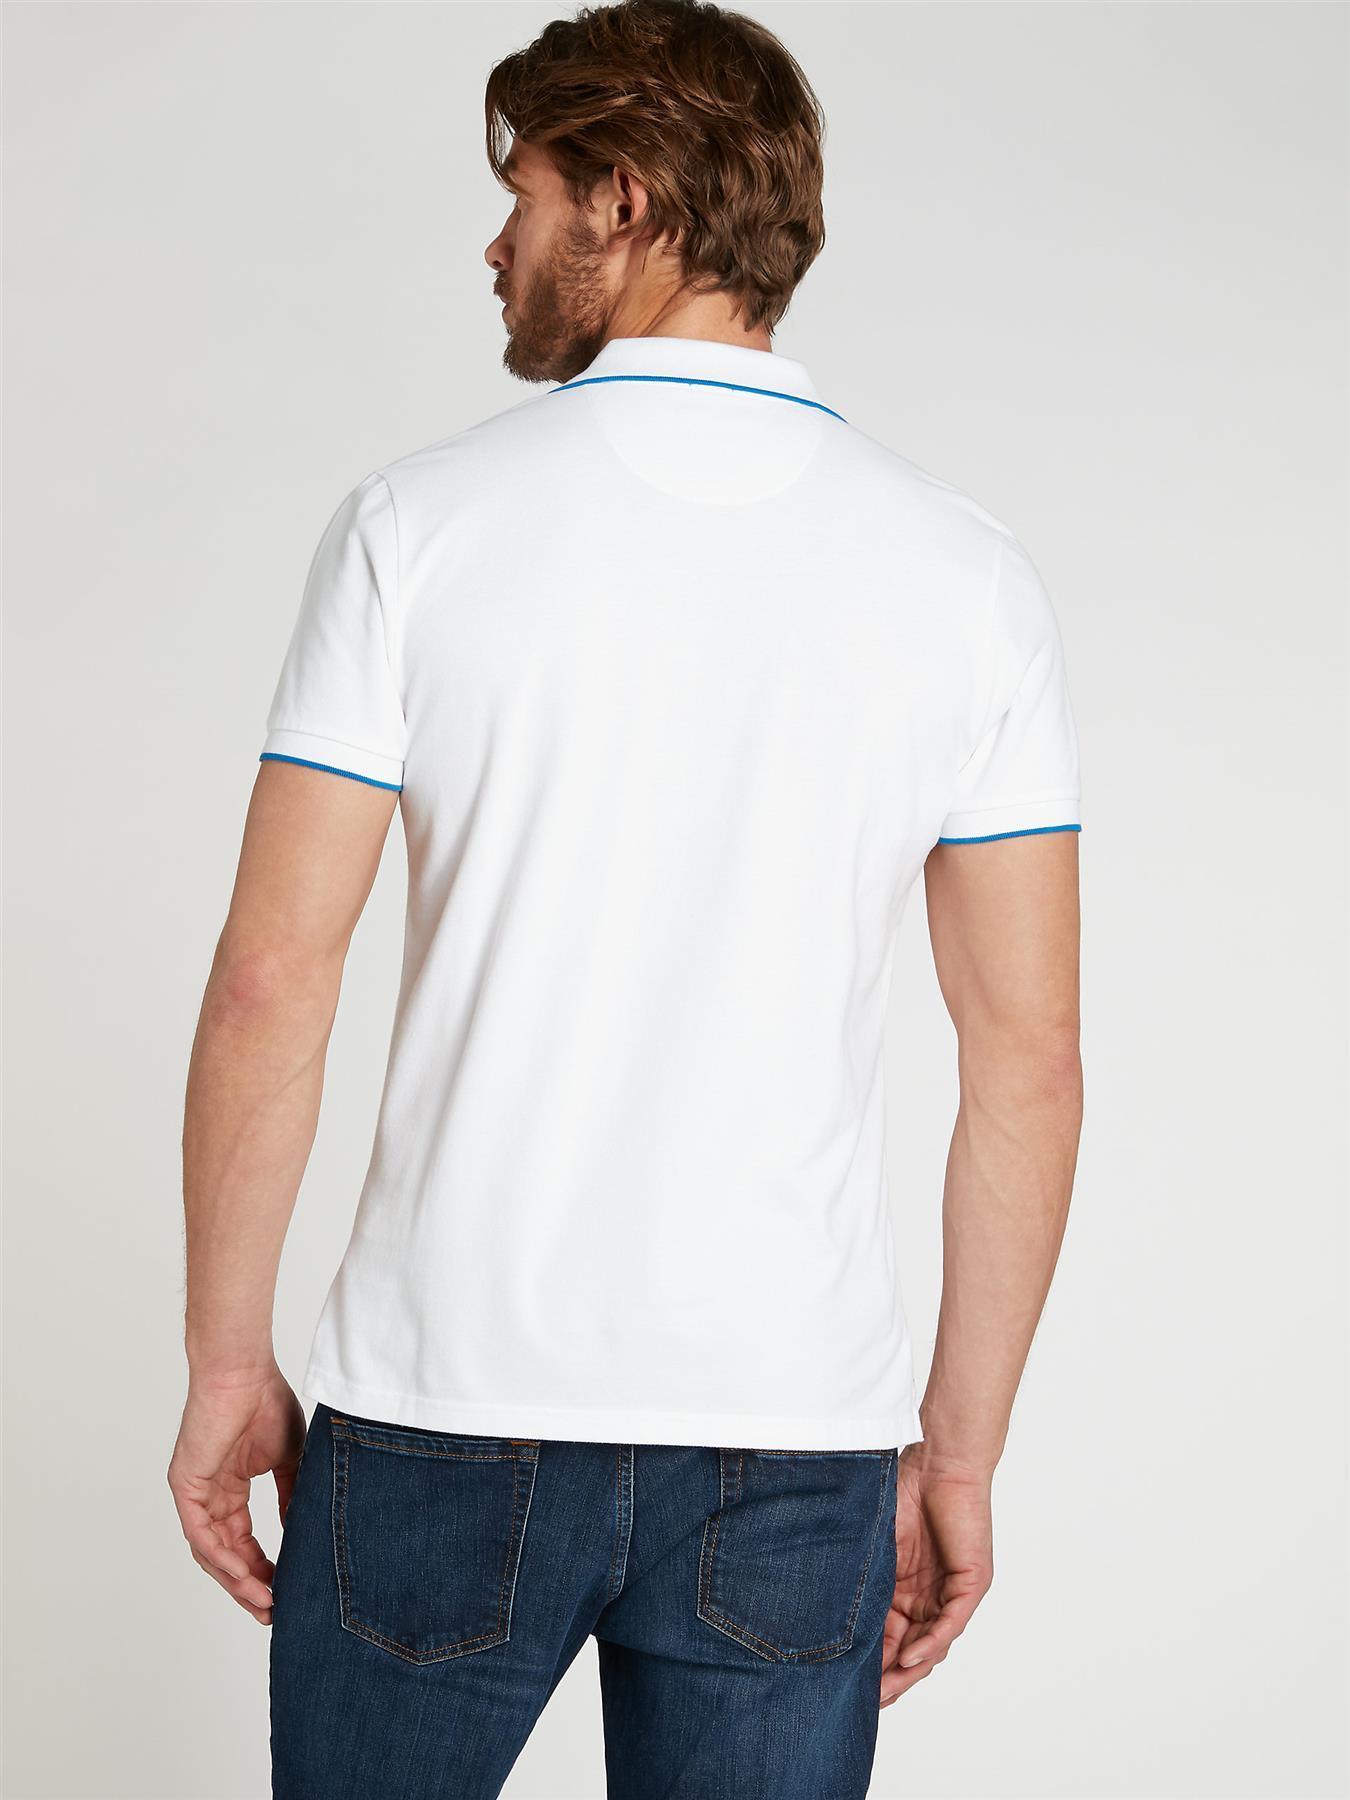 NORTH-SAILS-Mens-Legacy-Heritage-Short-Sleeve-Polo-Shirt-SALE-RRP-50 thumbnail 86